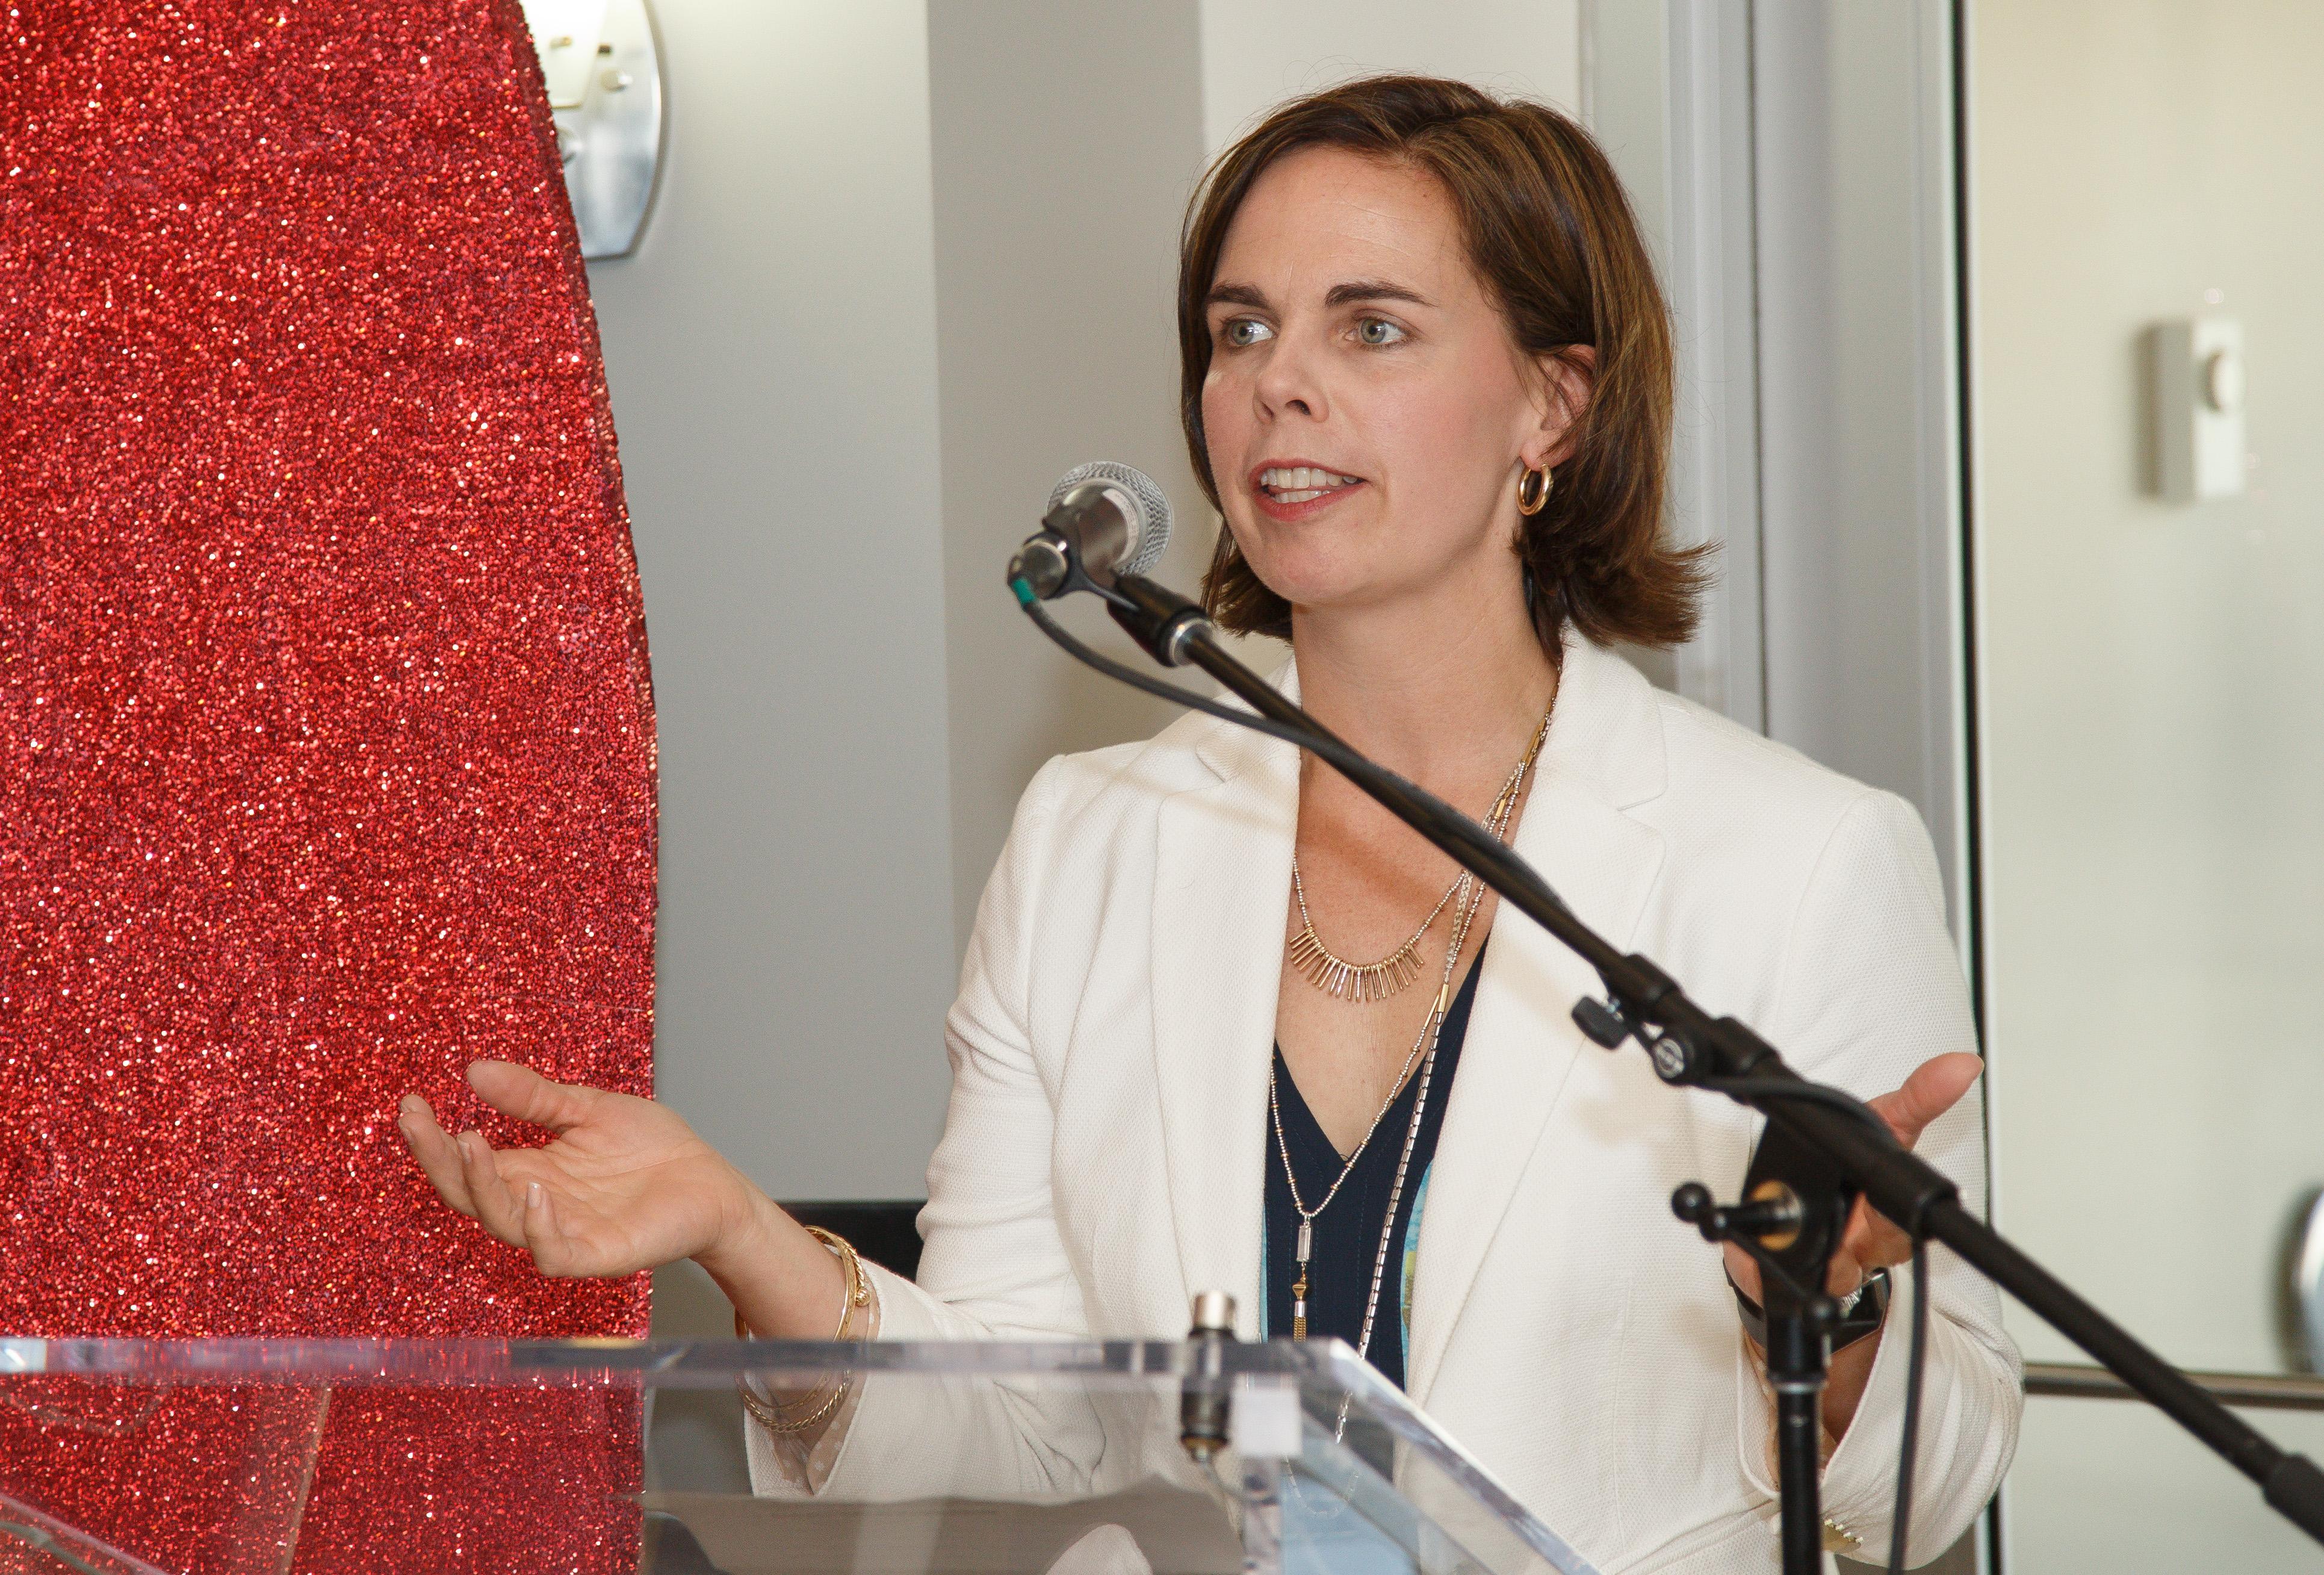 Erin Crowe - Board Chair of CHEO